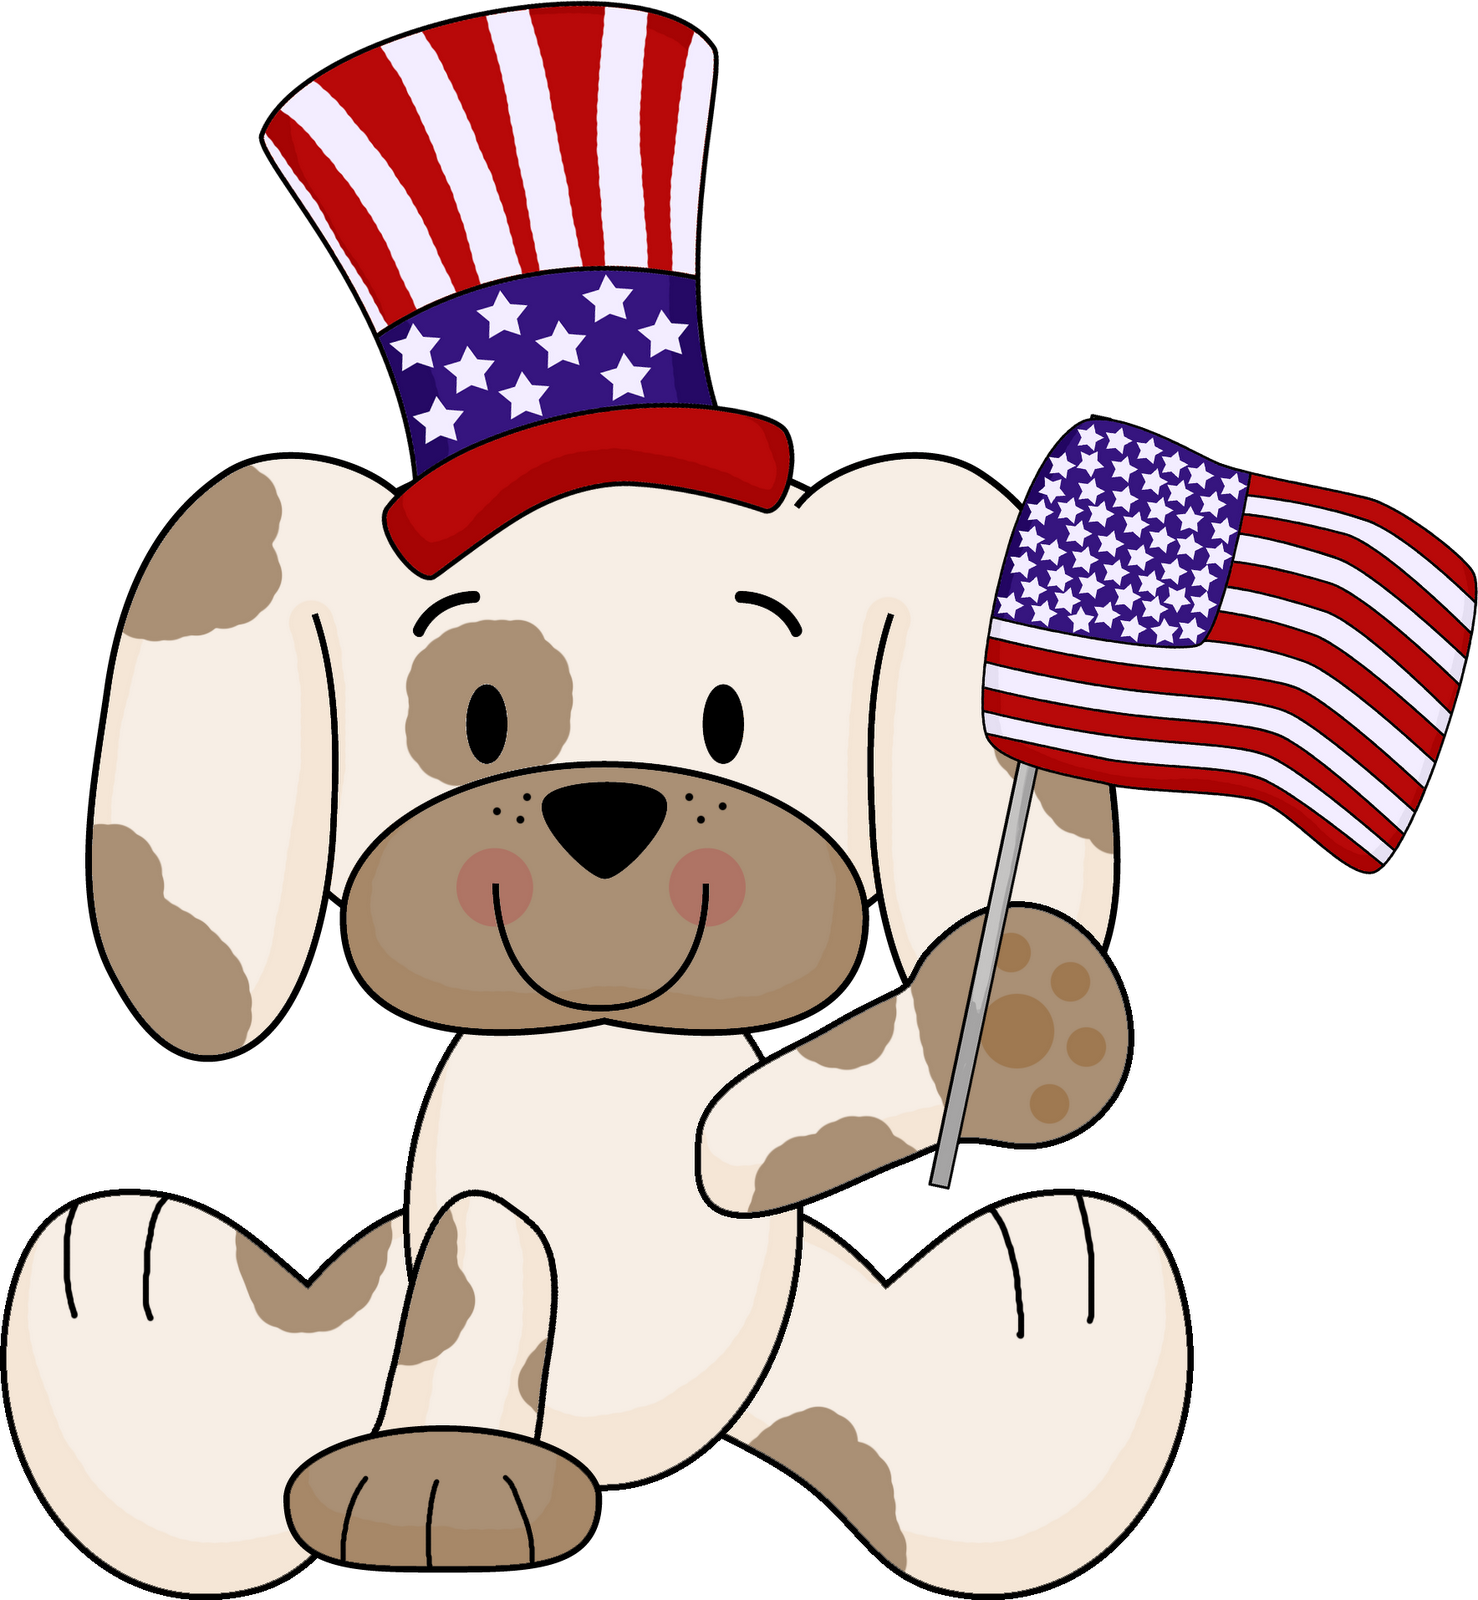 America symbols clipart clipart freeuse stock Free American Symbols Cliparts, Download Free Clip Art, Free Clip ... clipart freeuse stock